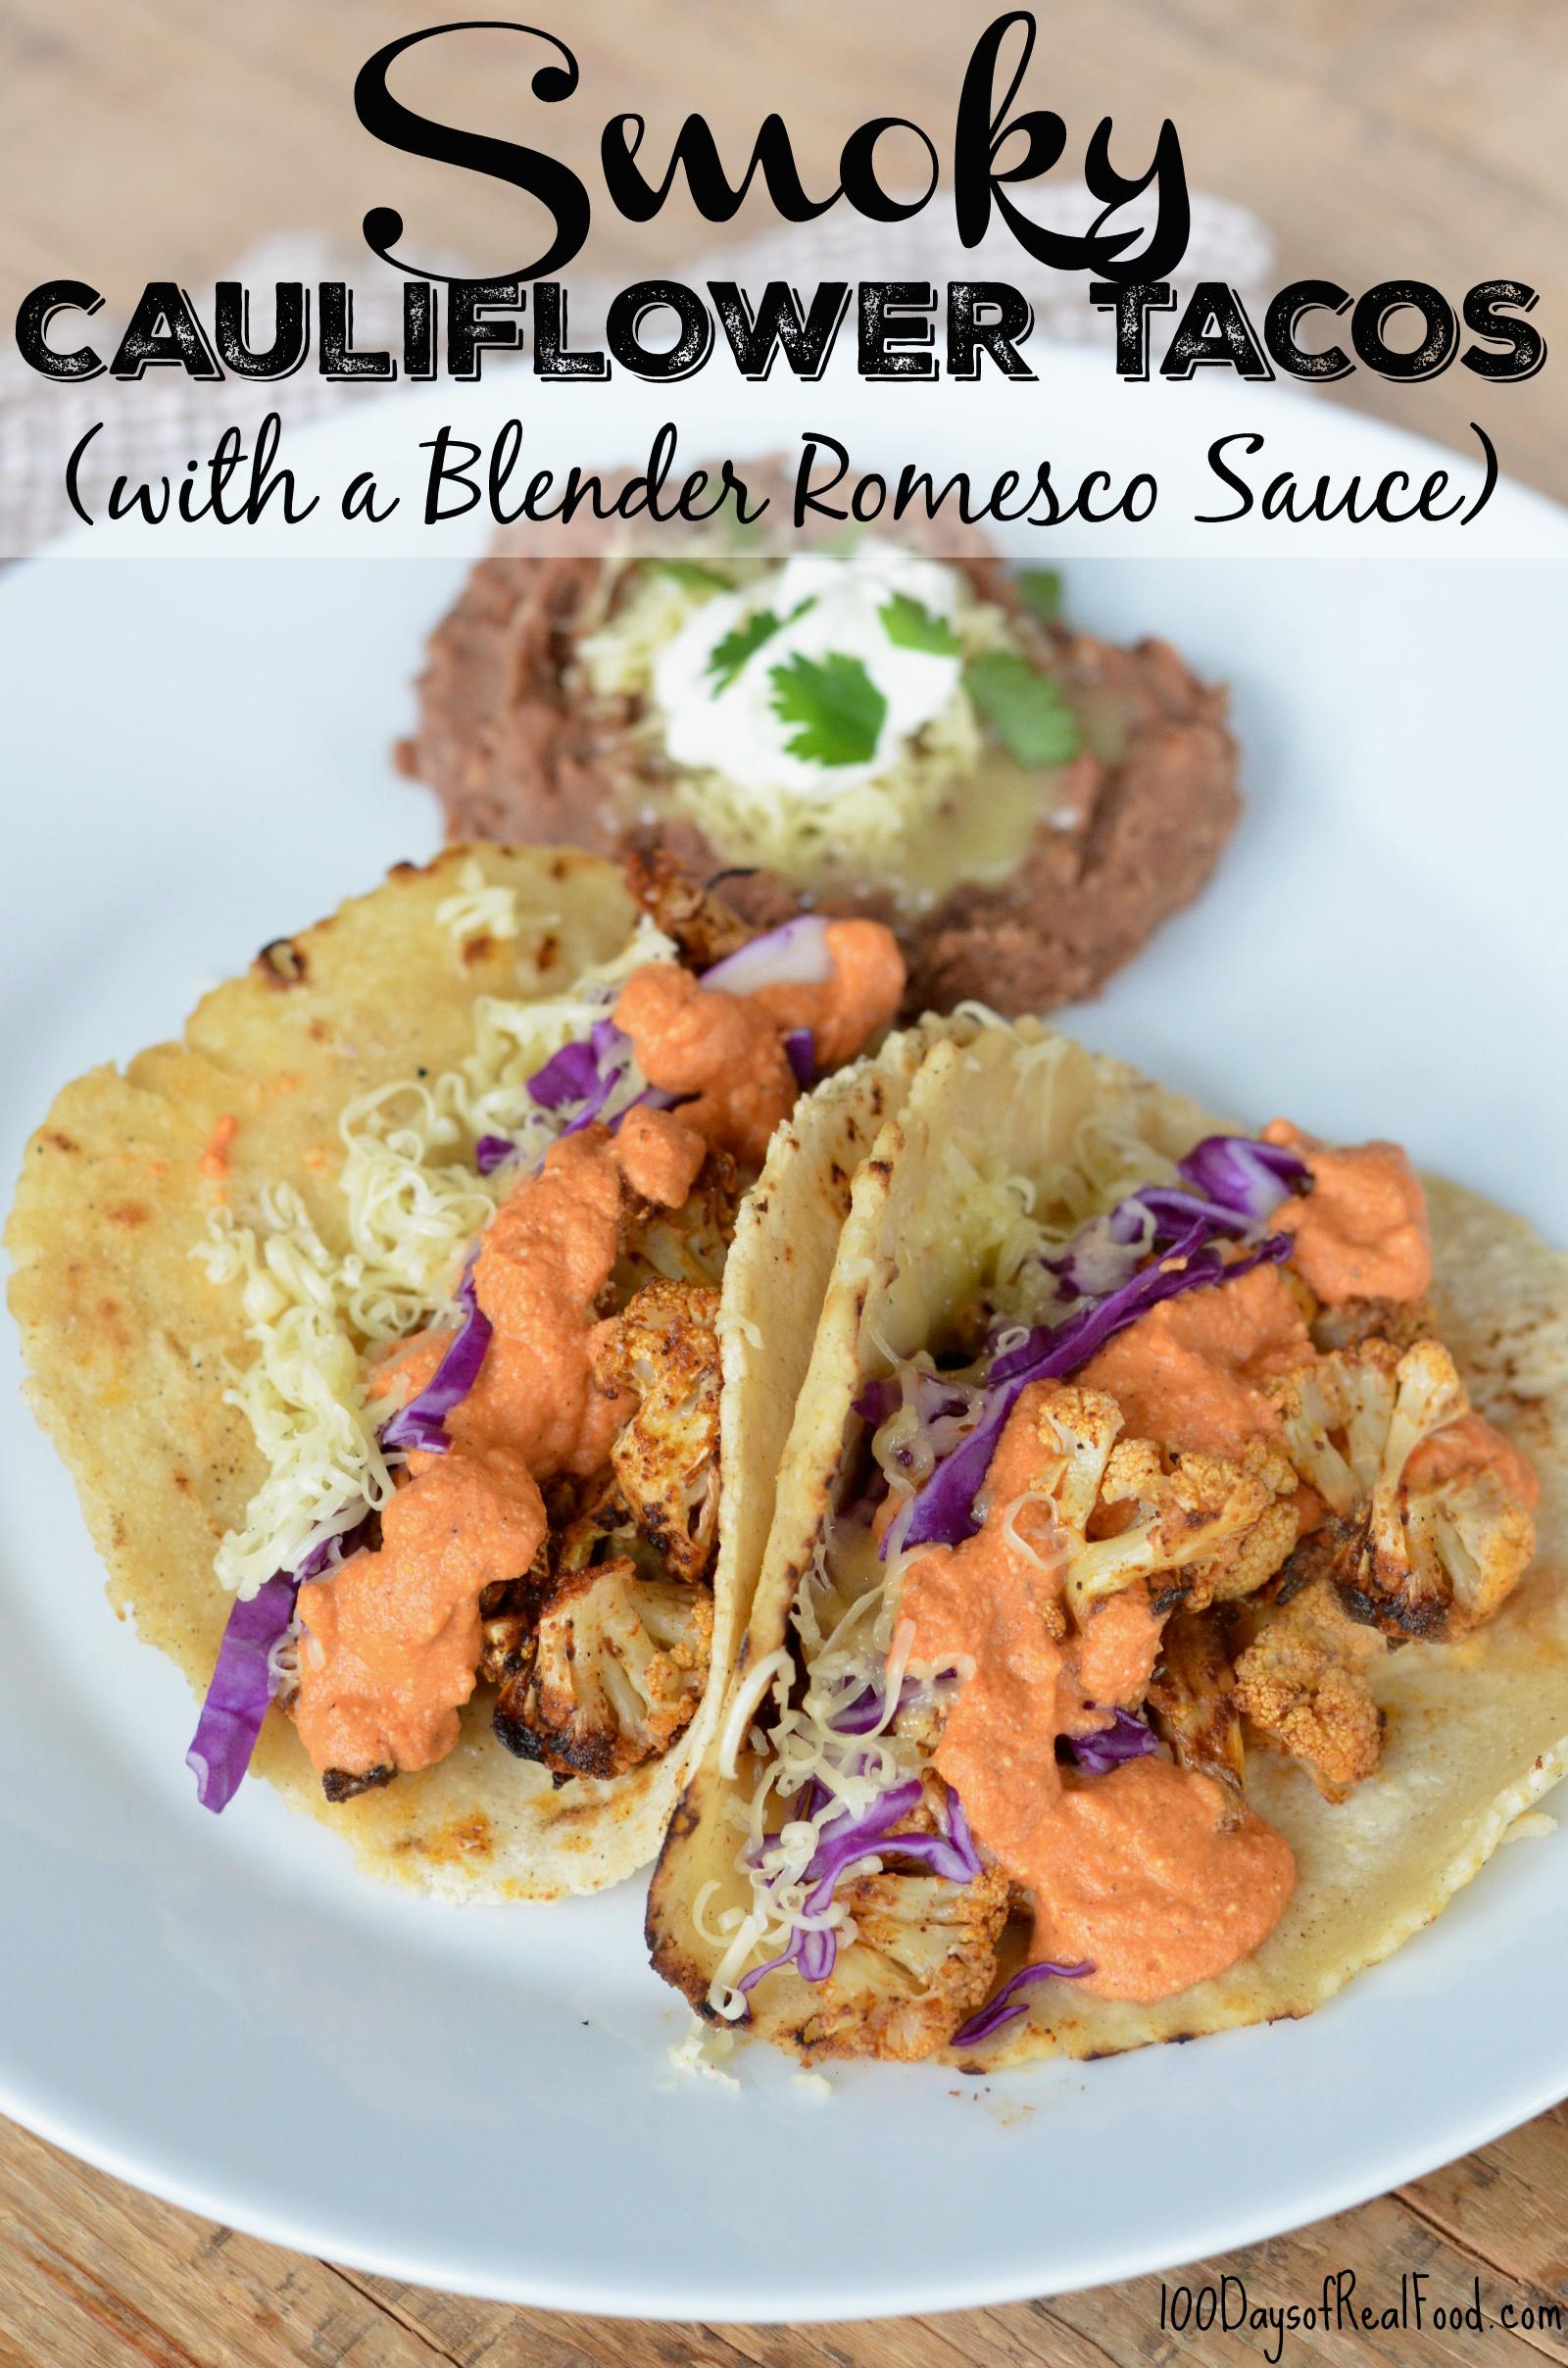 Smoky Cauliflower Tacos (with Blender Romesco Sauce) 3